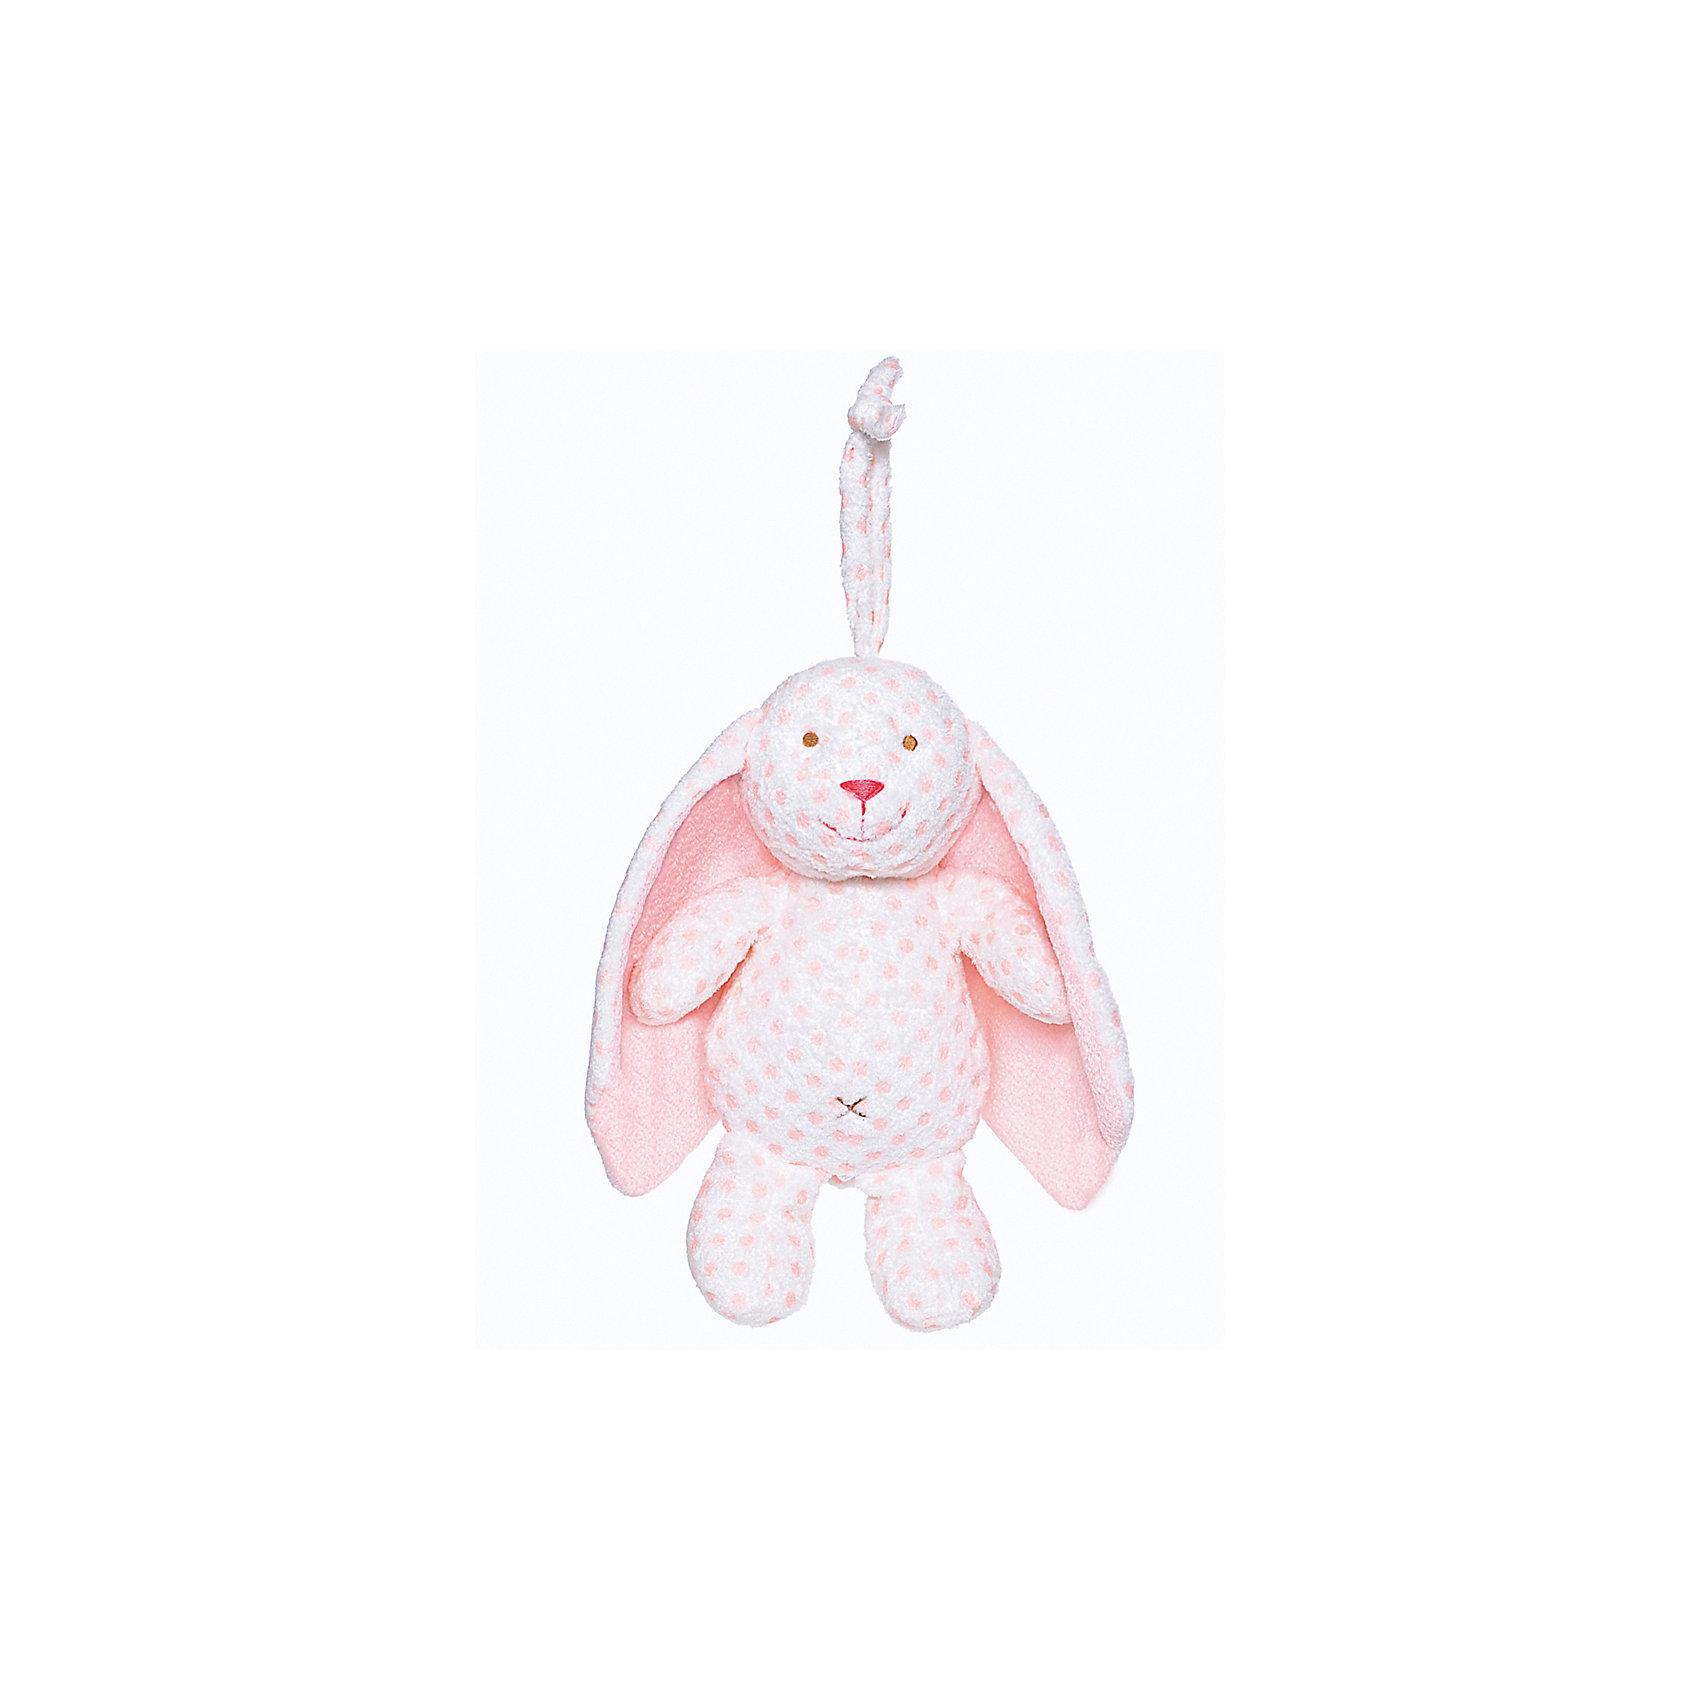 Музыкальная игрушка Кролик -  Большие ушки, Тедди бэби, Teddykompaniet